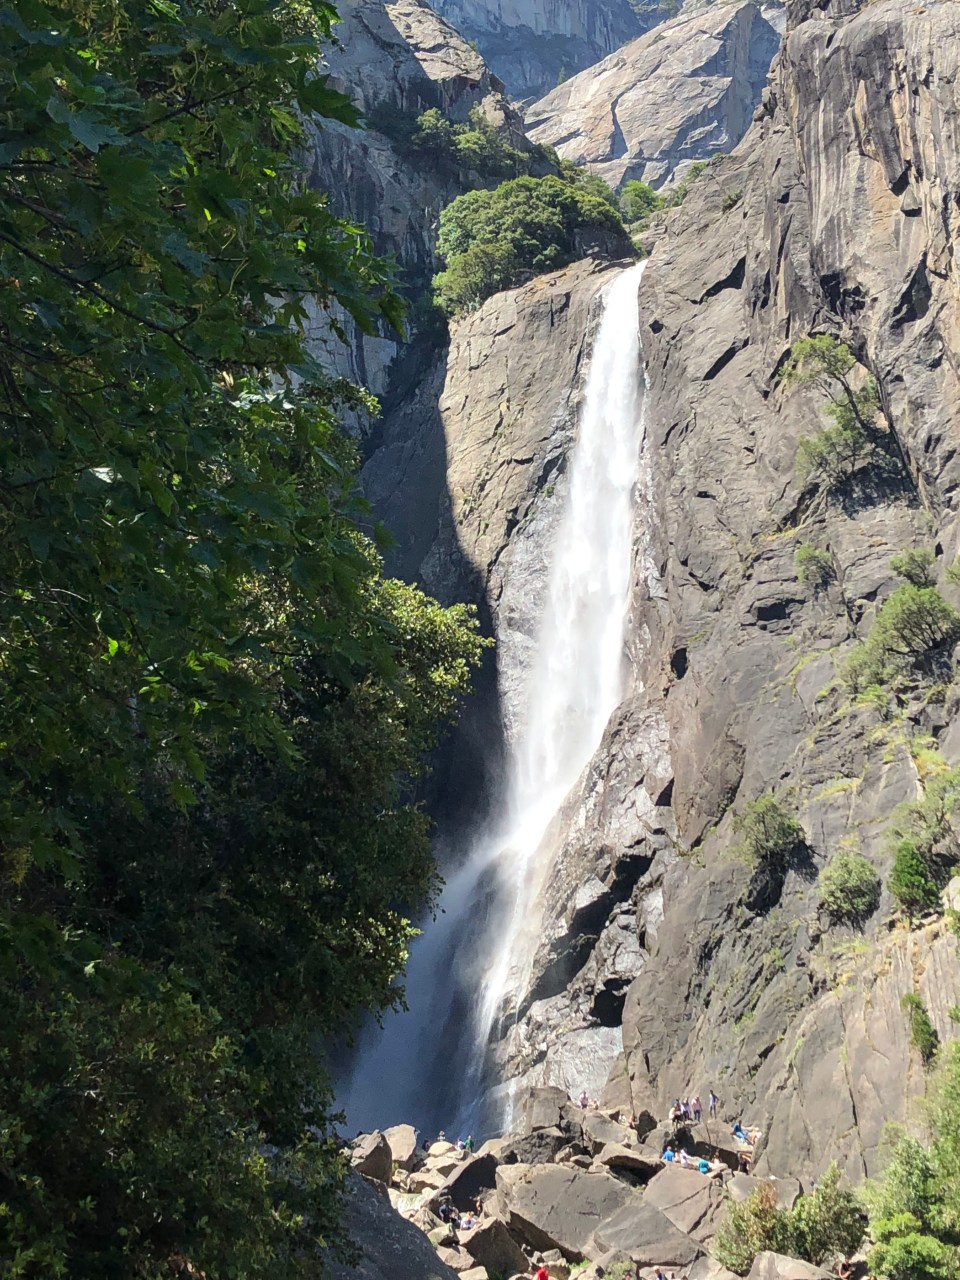 Yosemite National Park - Yosemite Falls 1